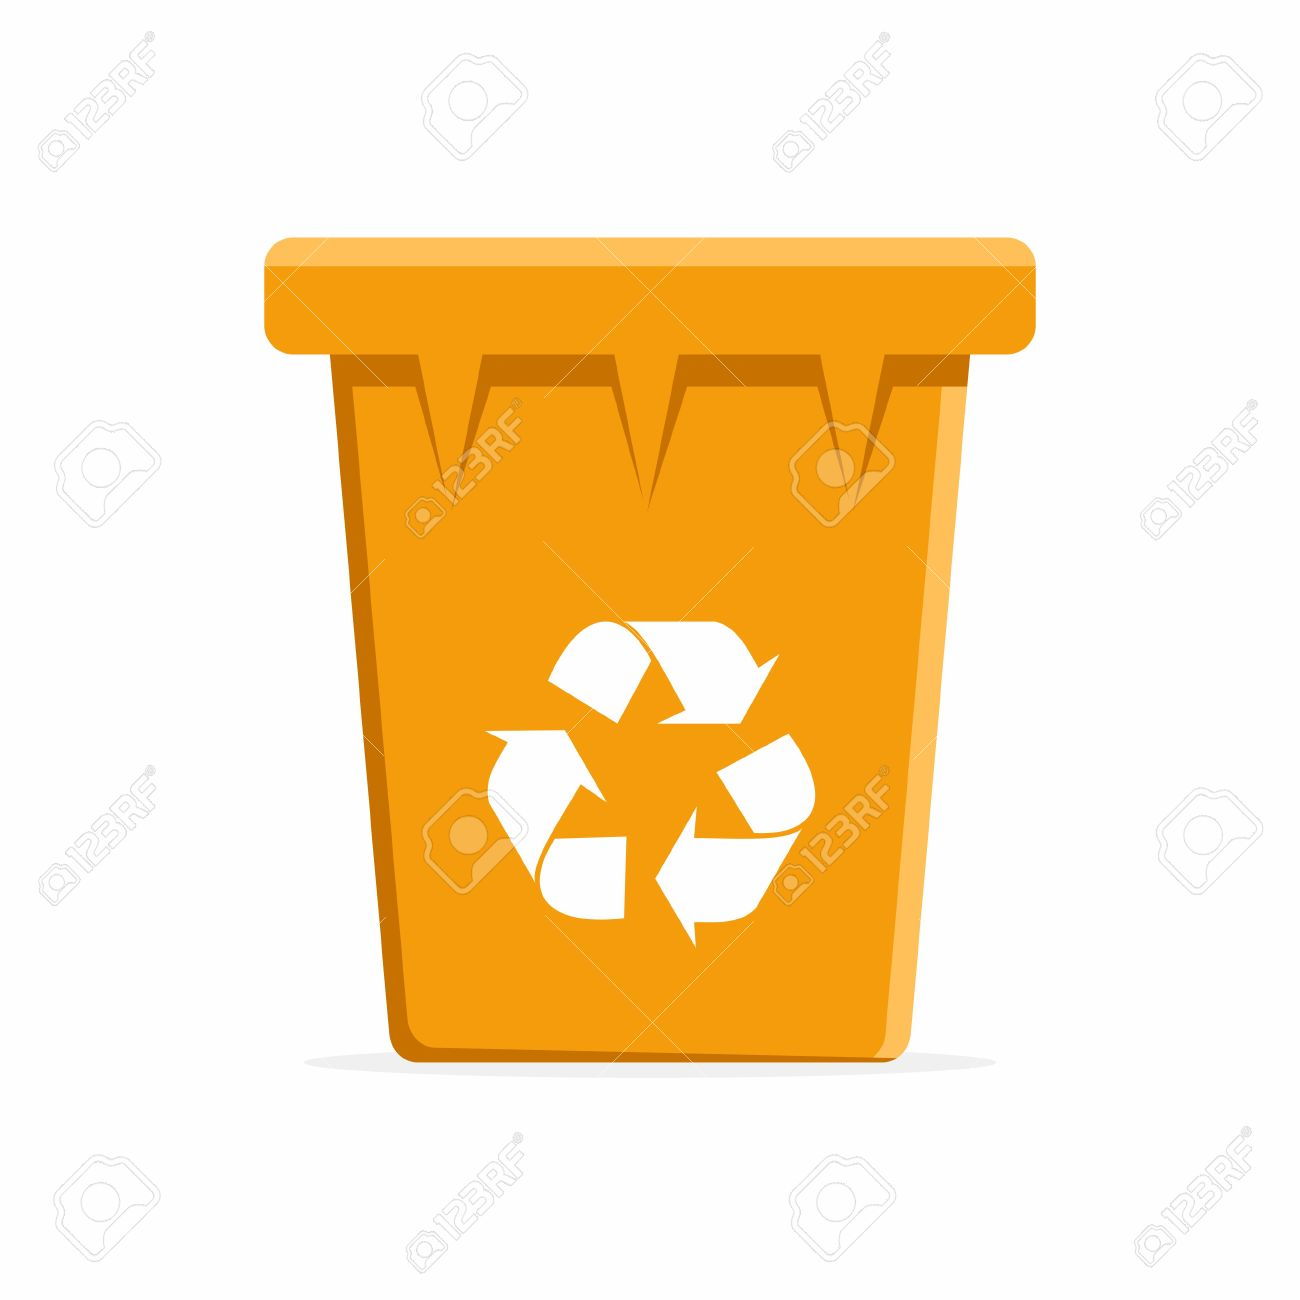 Vector Orange Recycle Bin for Trash and Garbage. Vector Illustration - 48220730